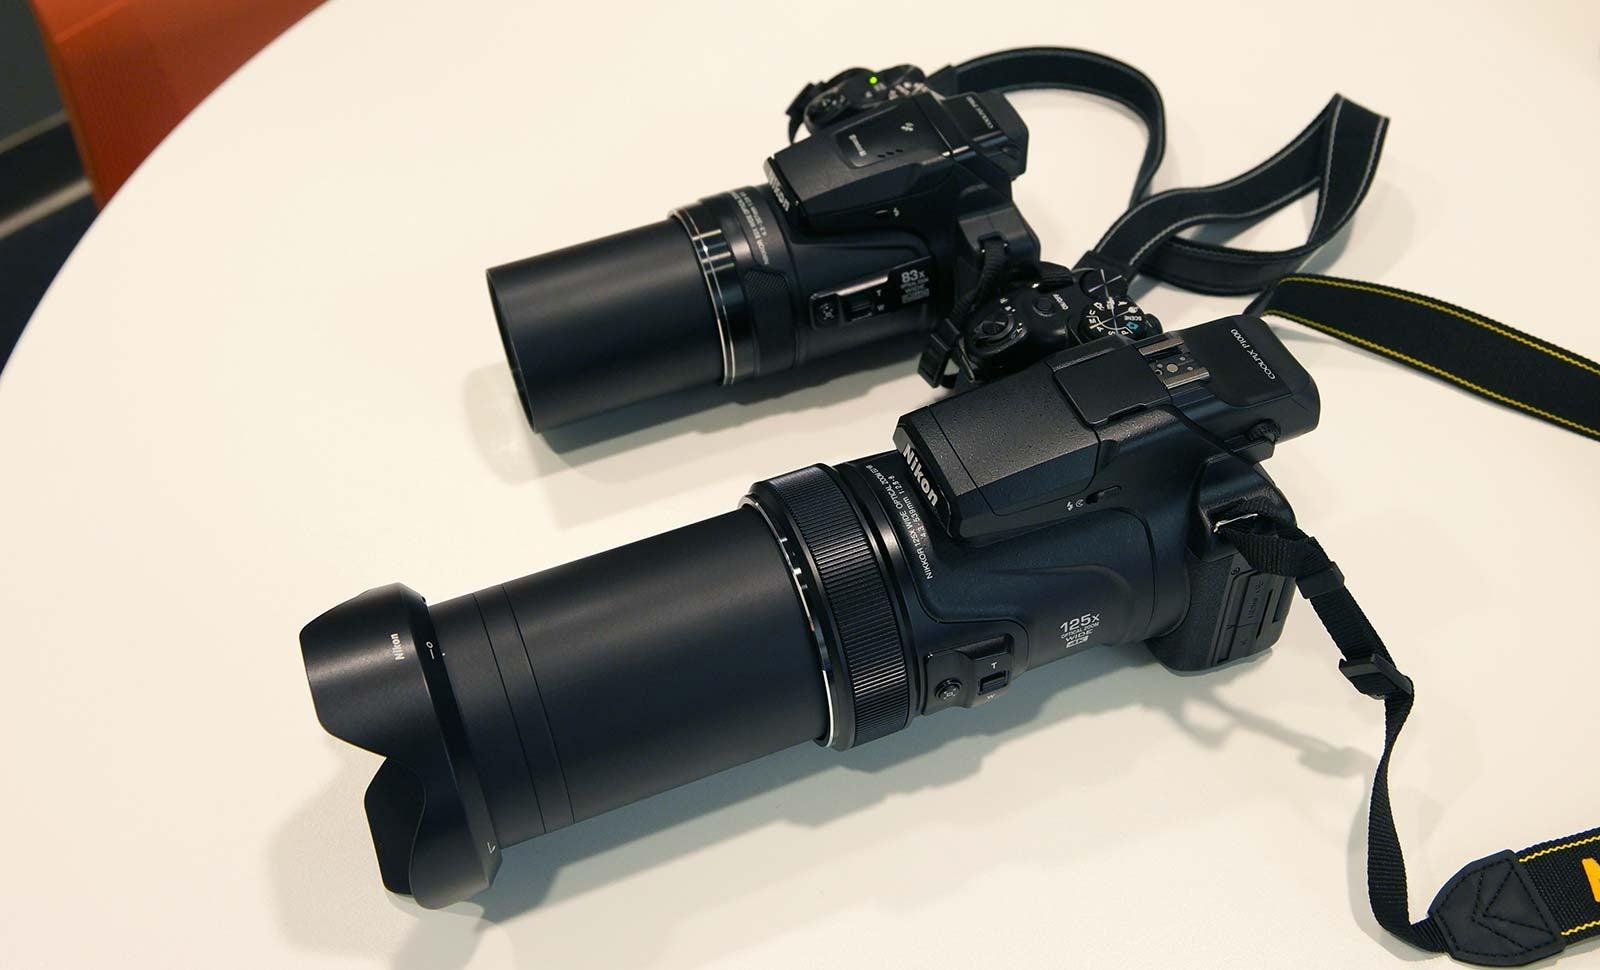 Nikon's New CoolPix P1000 Has a Bananas 125x Zoom Lens